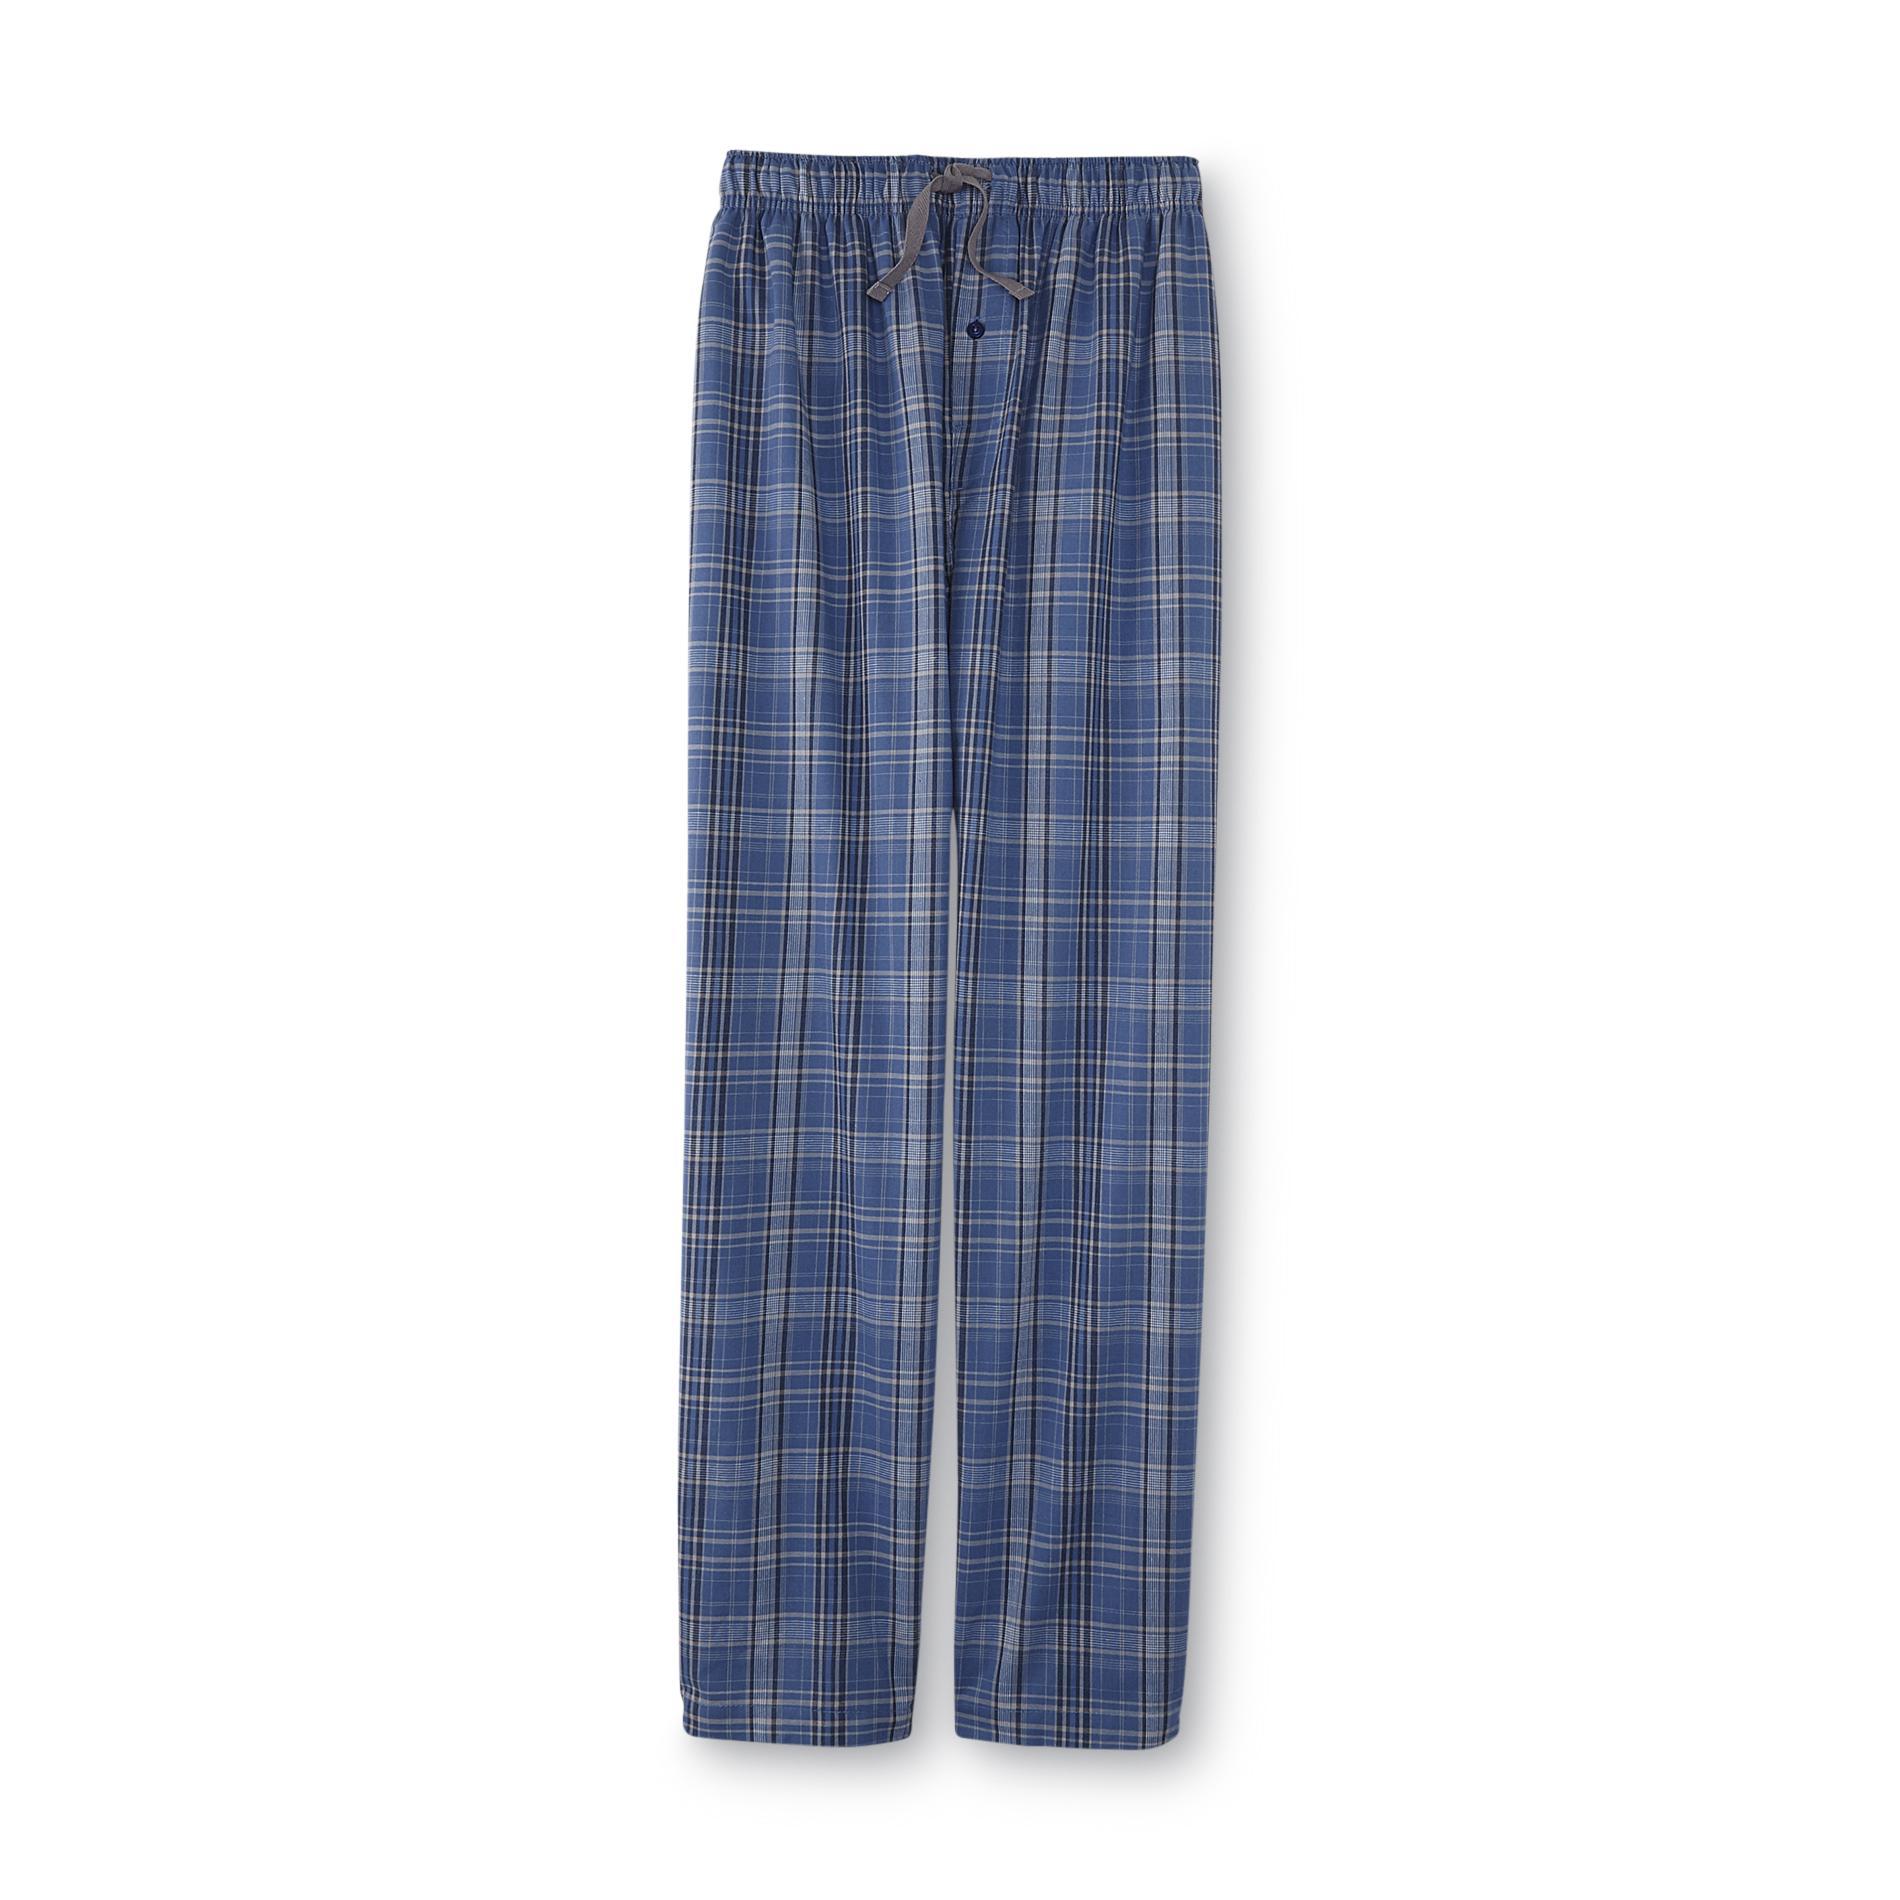 Men's Pajama Pants - Plaid